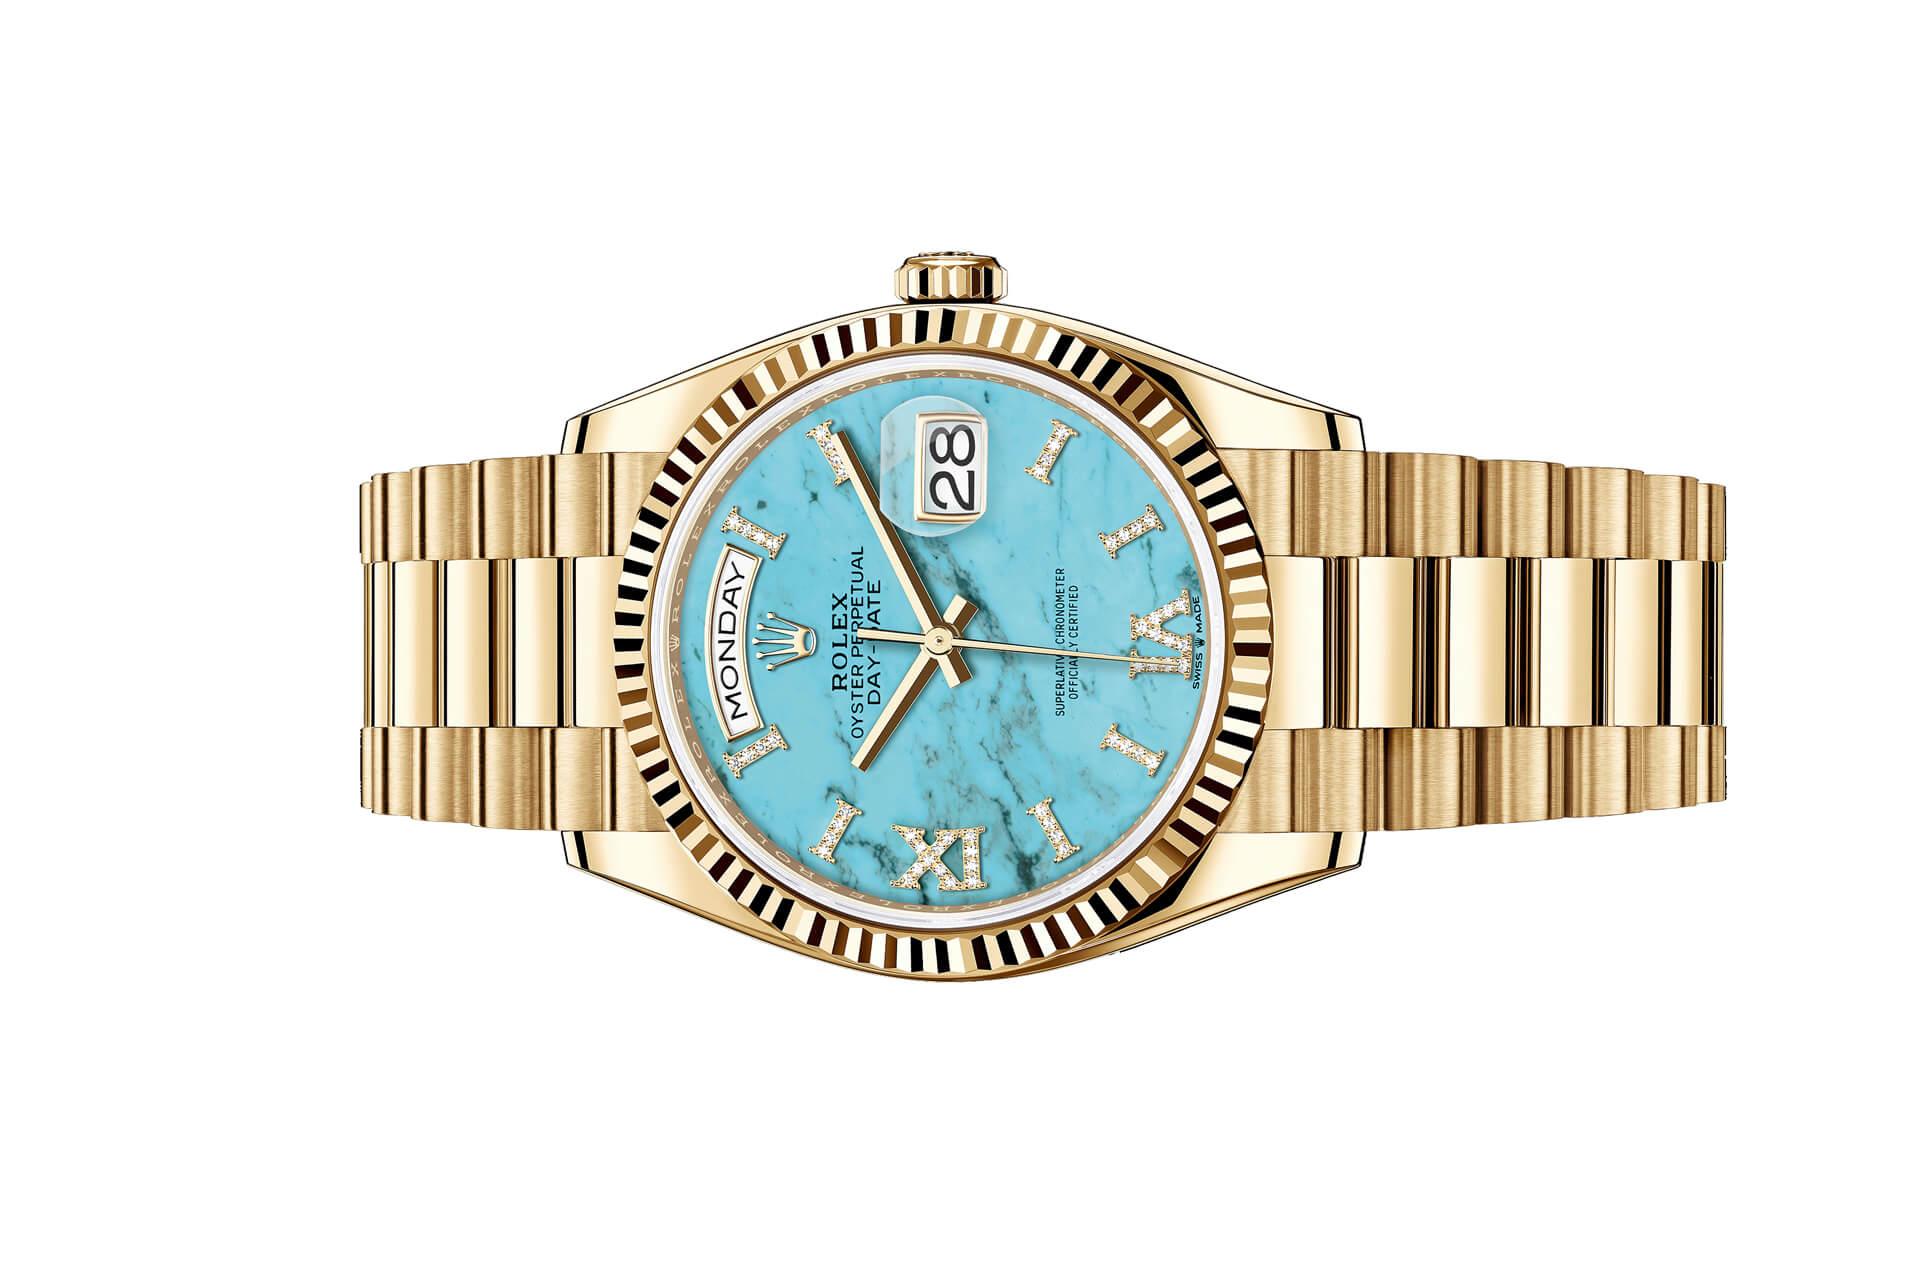 Đồng hồ Rolex Day-Date 36 128238